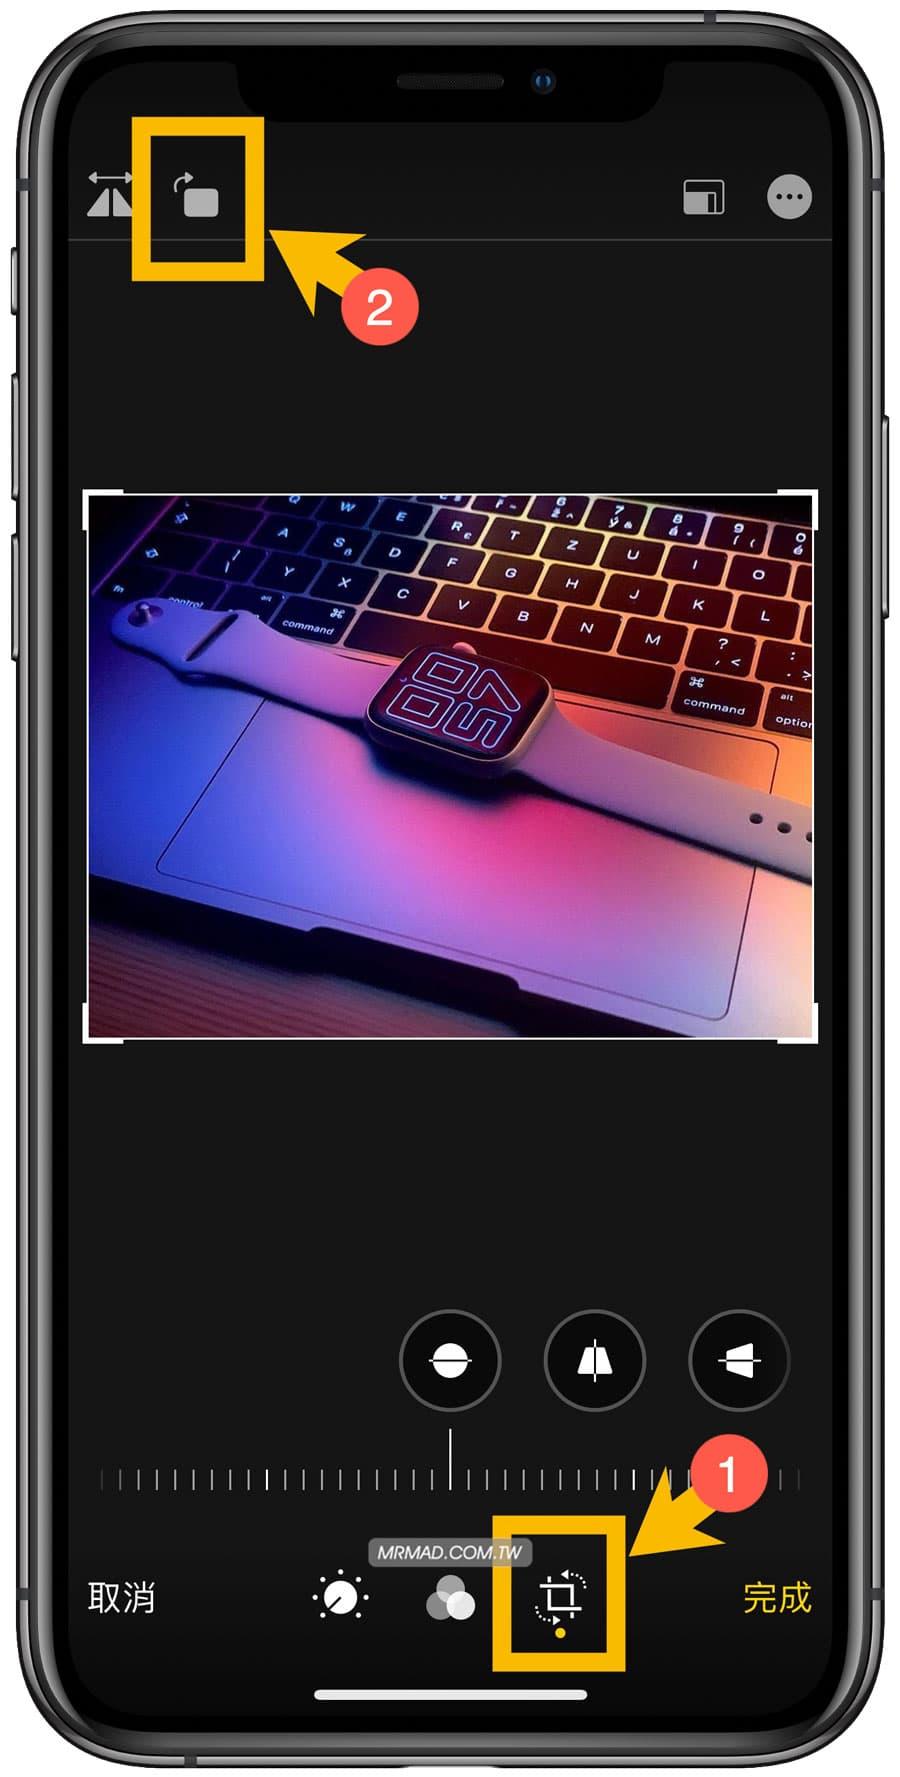 iPhone拍照左右相反?免捷徑靠 iOS 內建調整照片水平翻轉 - 瘋先生